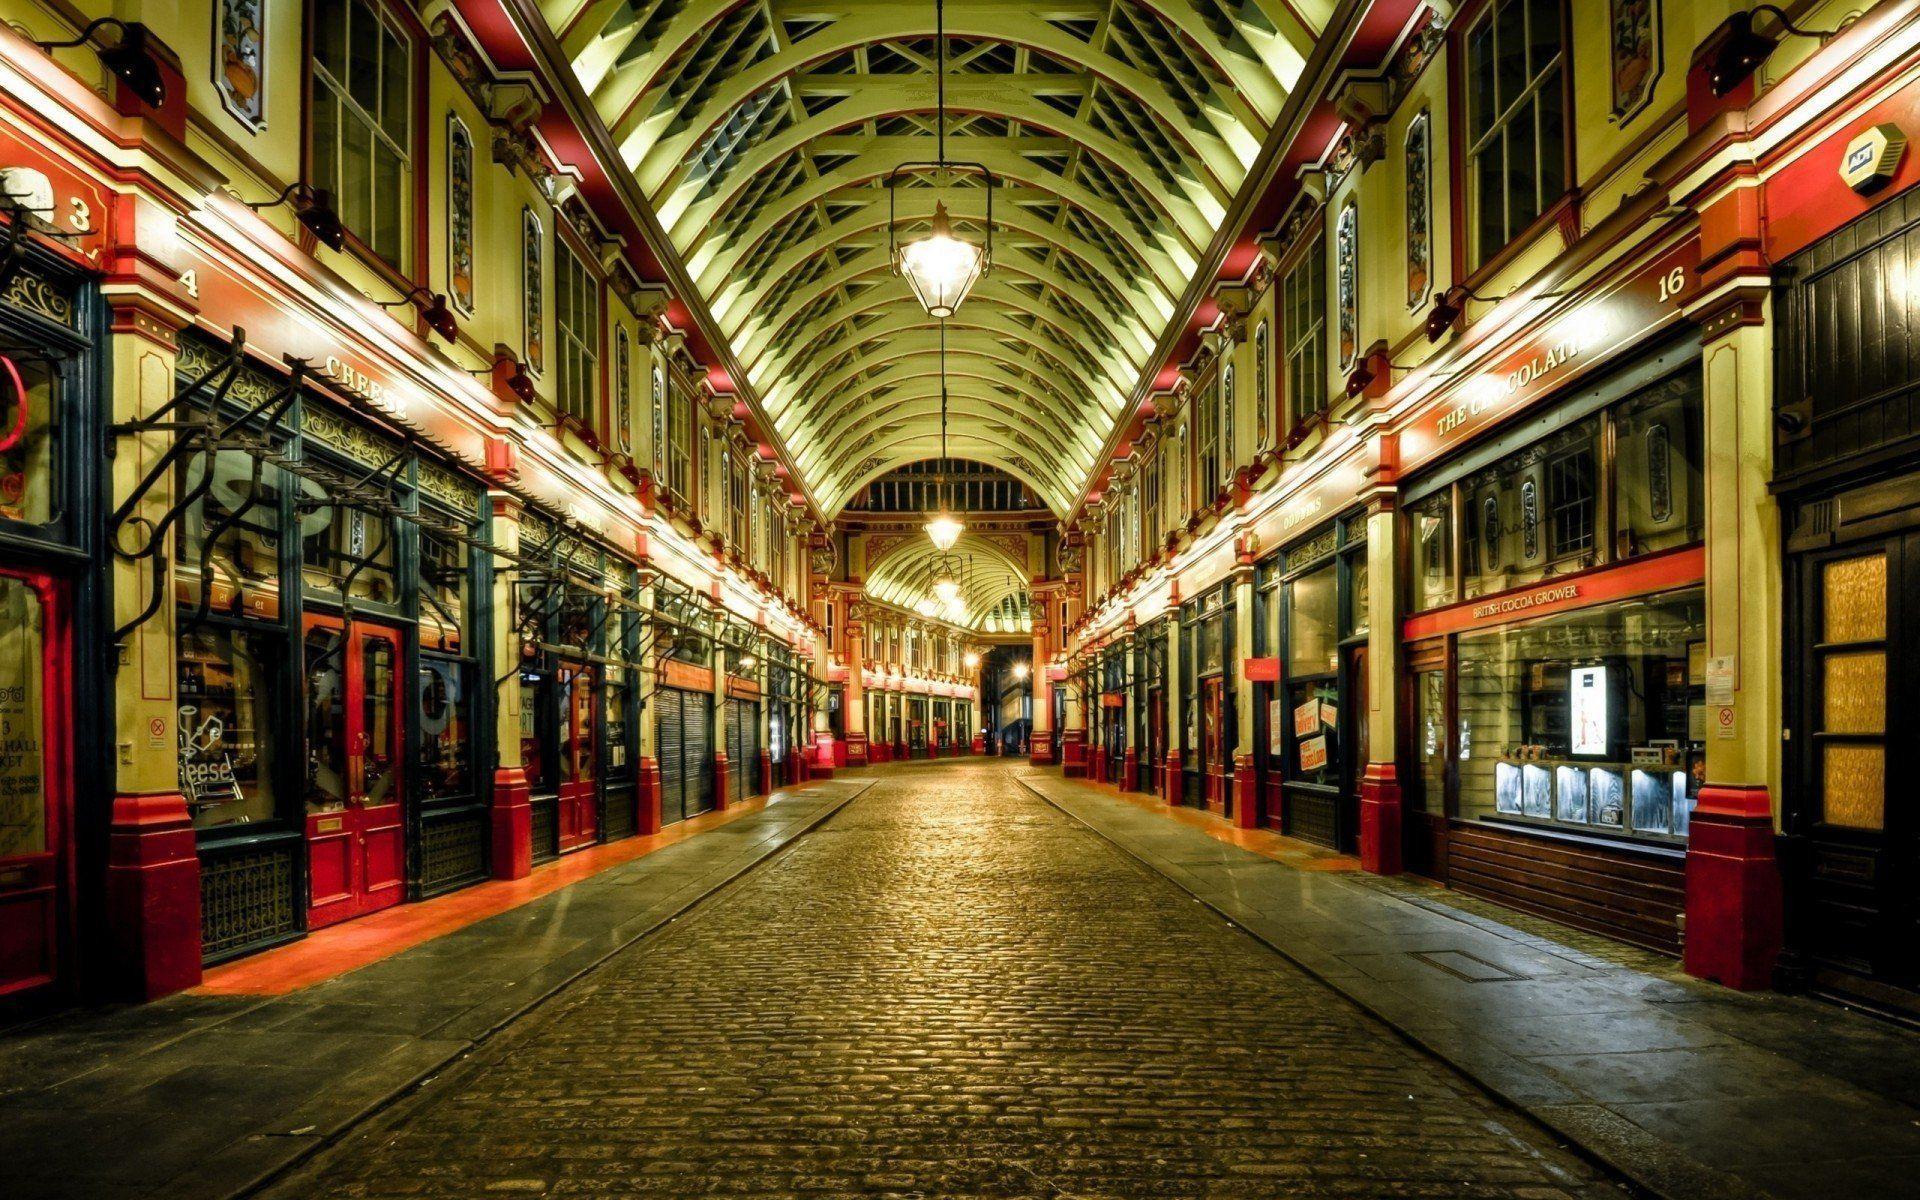 London Underground Wallpapers Top Free London Underground Backgrounds Wallpaperaccess